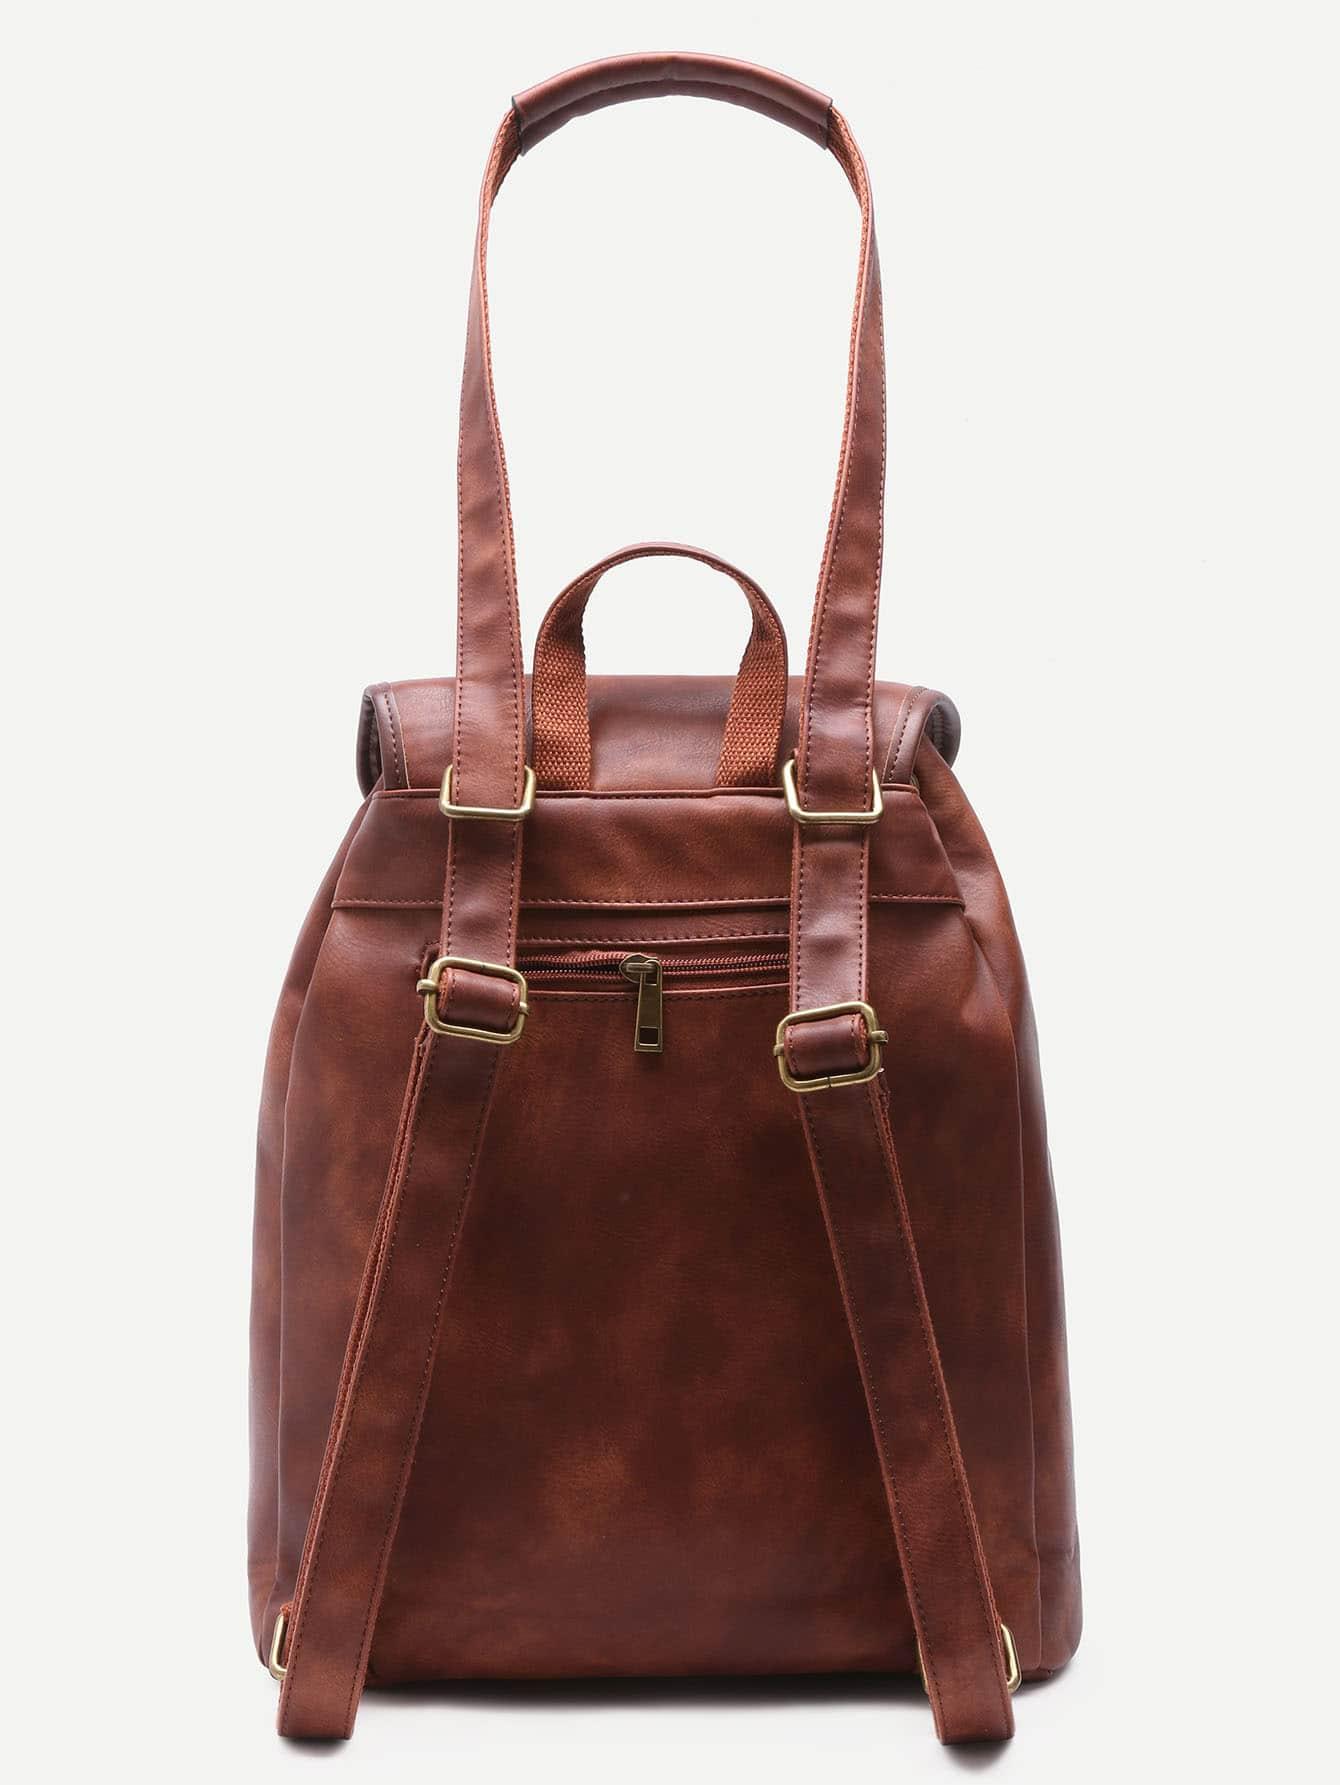 bag160927904_2